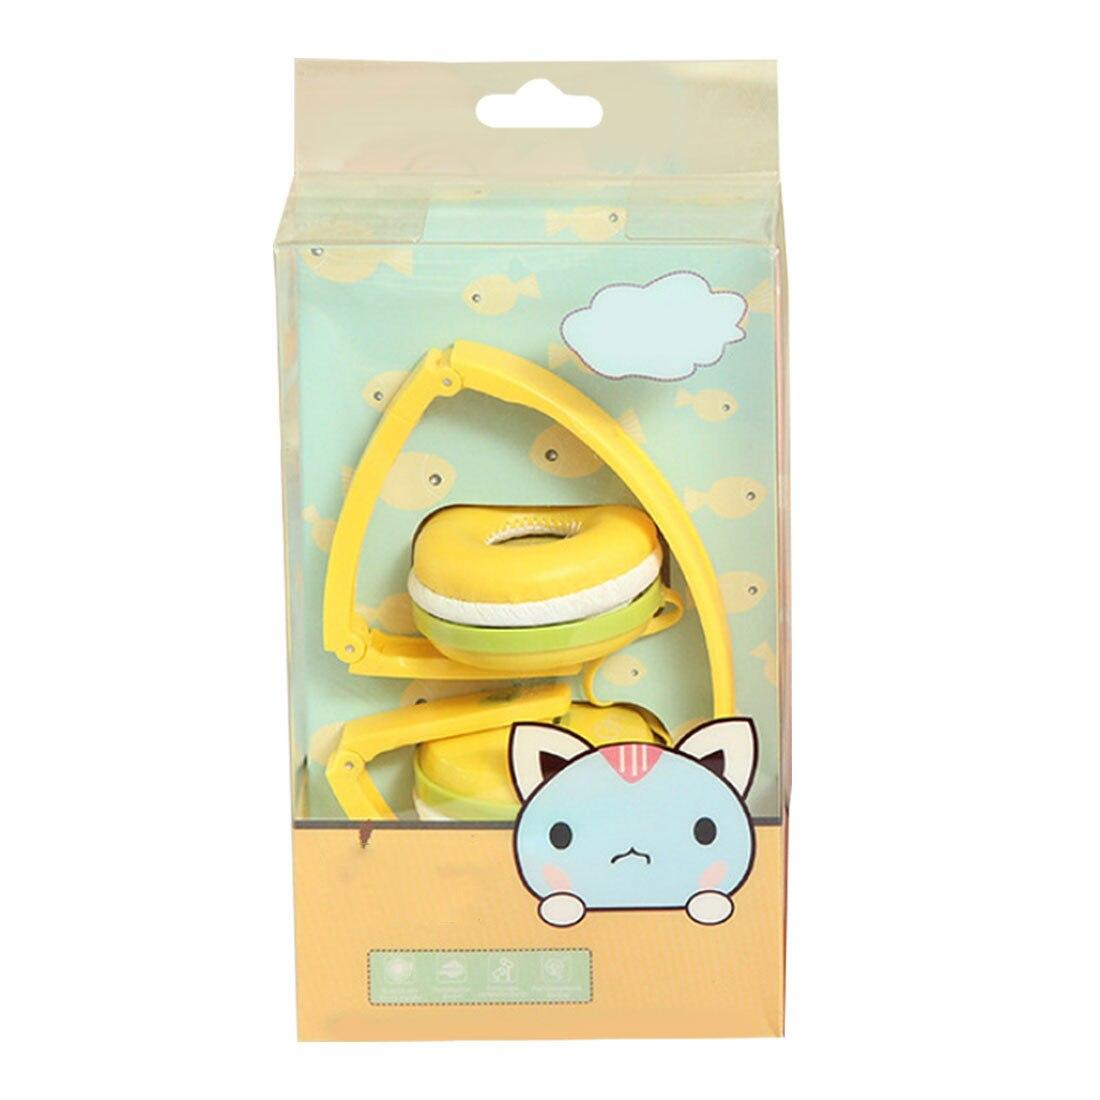 Marsnaska  Birthday Girl Children Gifts Cute Candy Color Foldable Kids Headset Earphone for Mp3 Smar